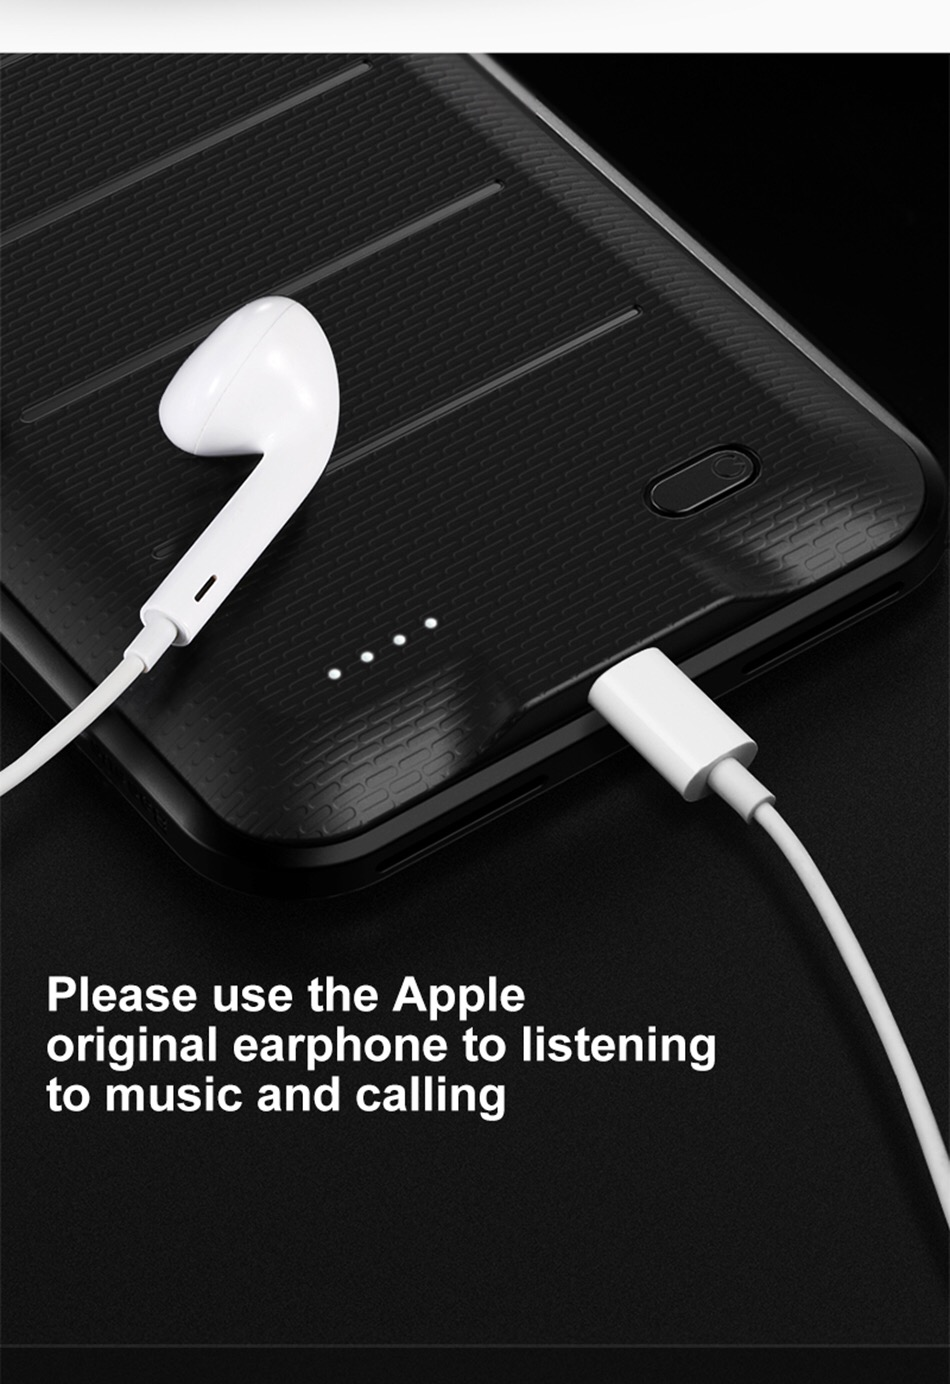 BASEUS เคสแบตสำรอง iPhone7Plus 5.5' ความจุสูง3650mAh แบบบางพิเศษ Ultrathin สีดำ